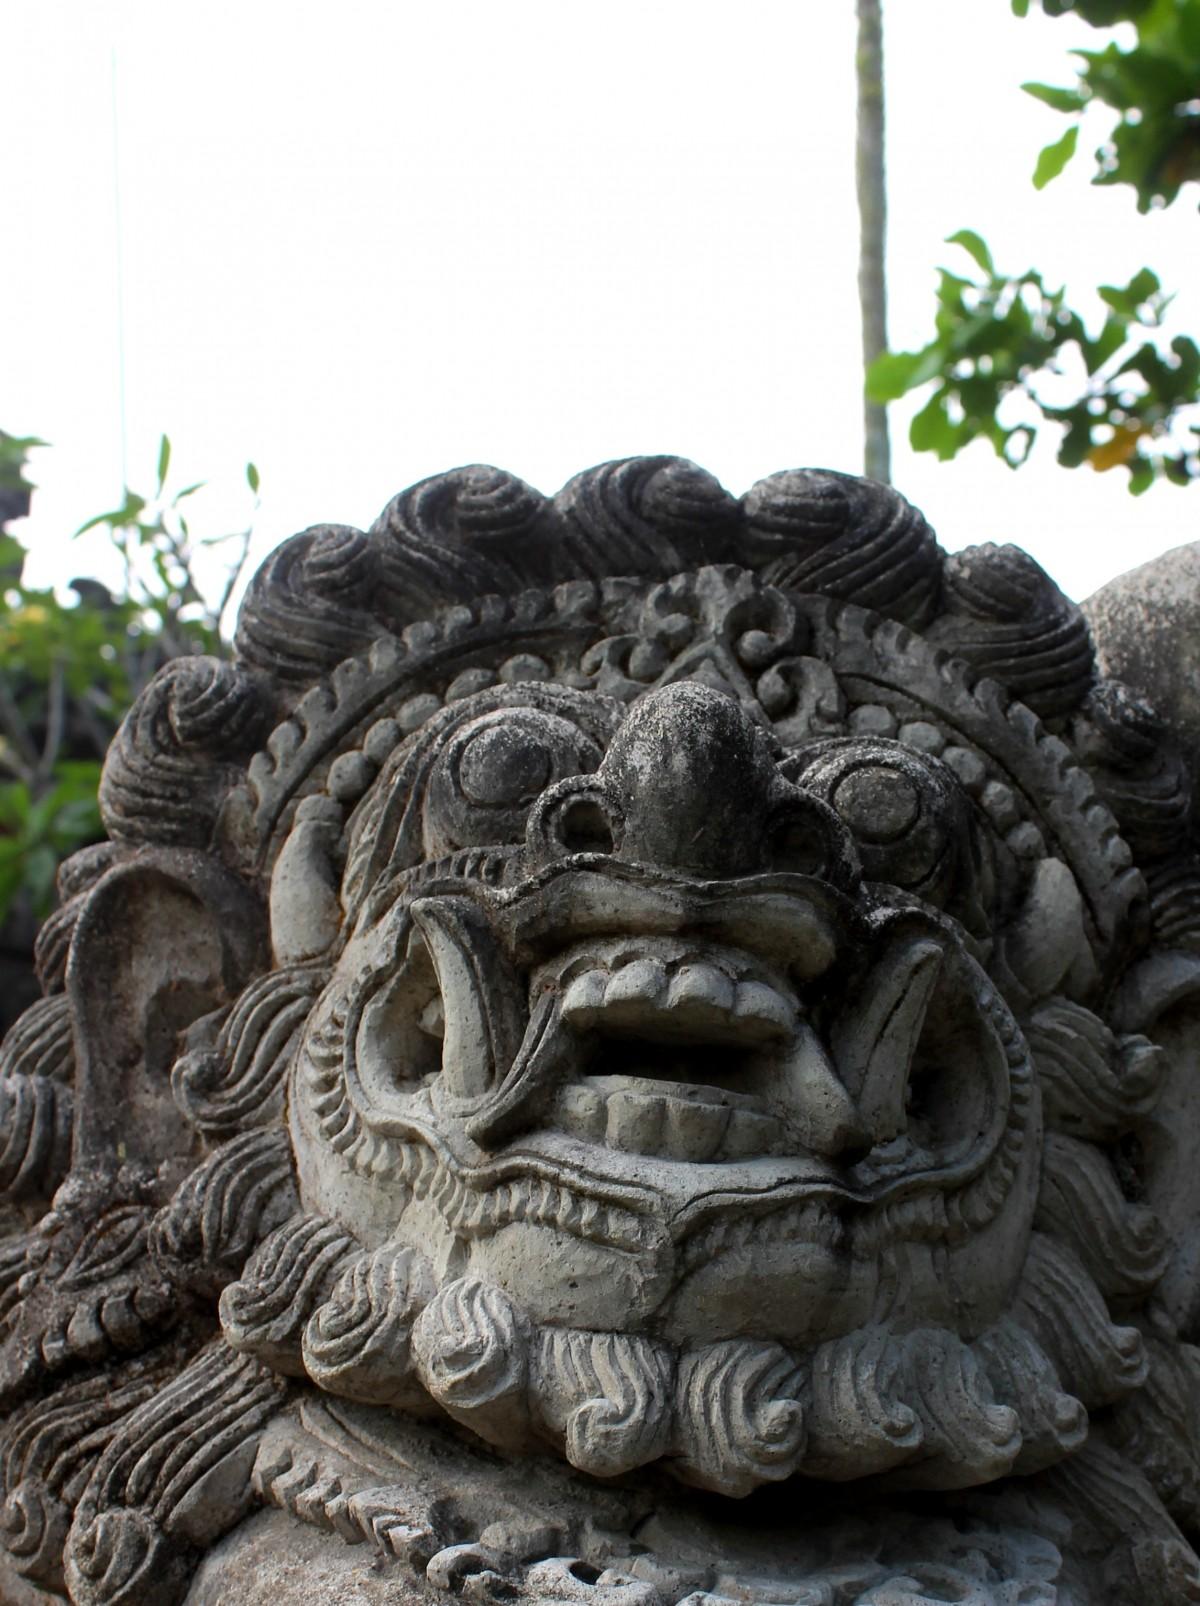 Free images monument asian statue gargoyle sculpture